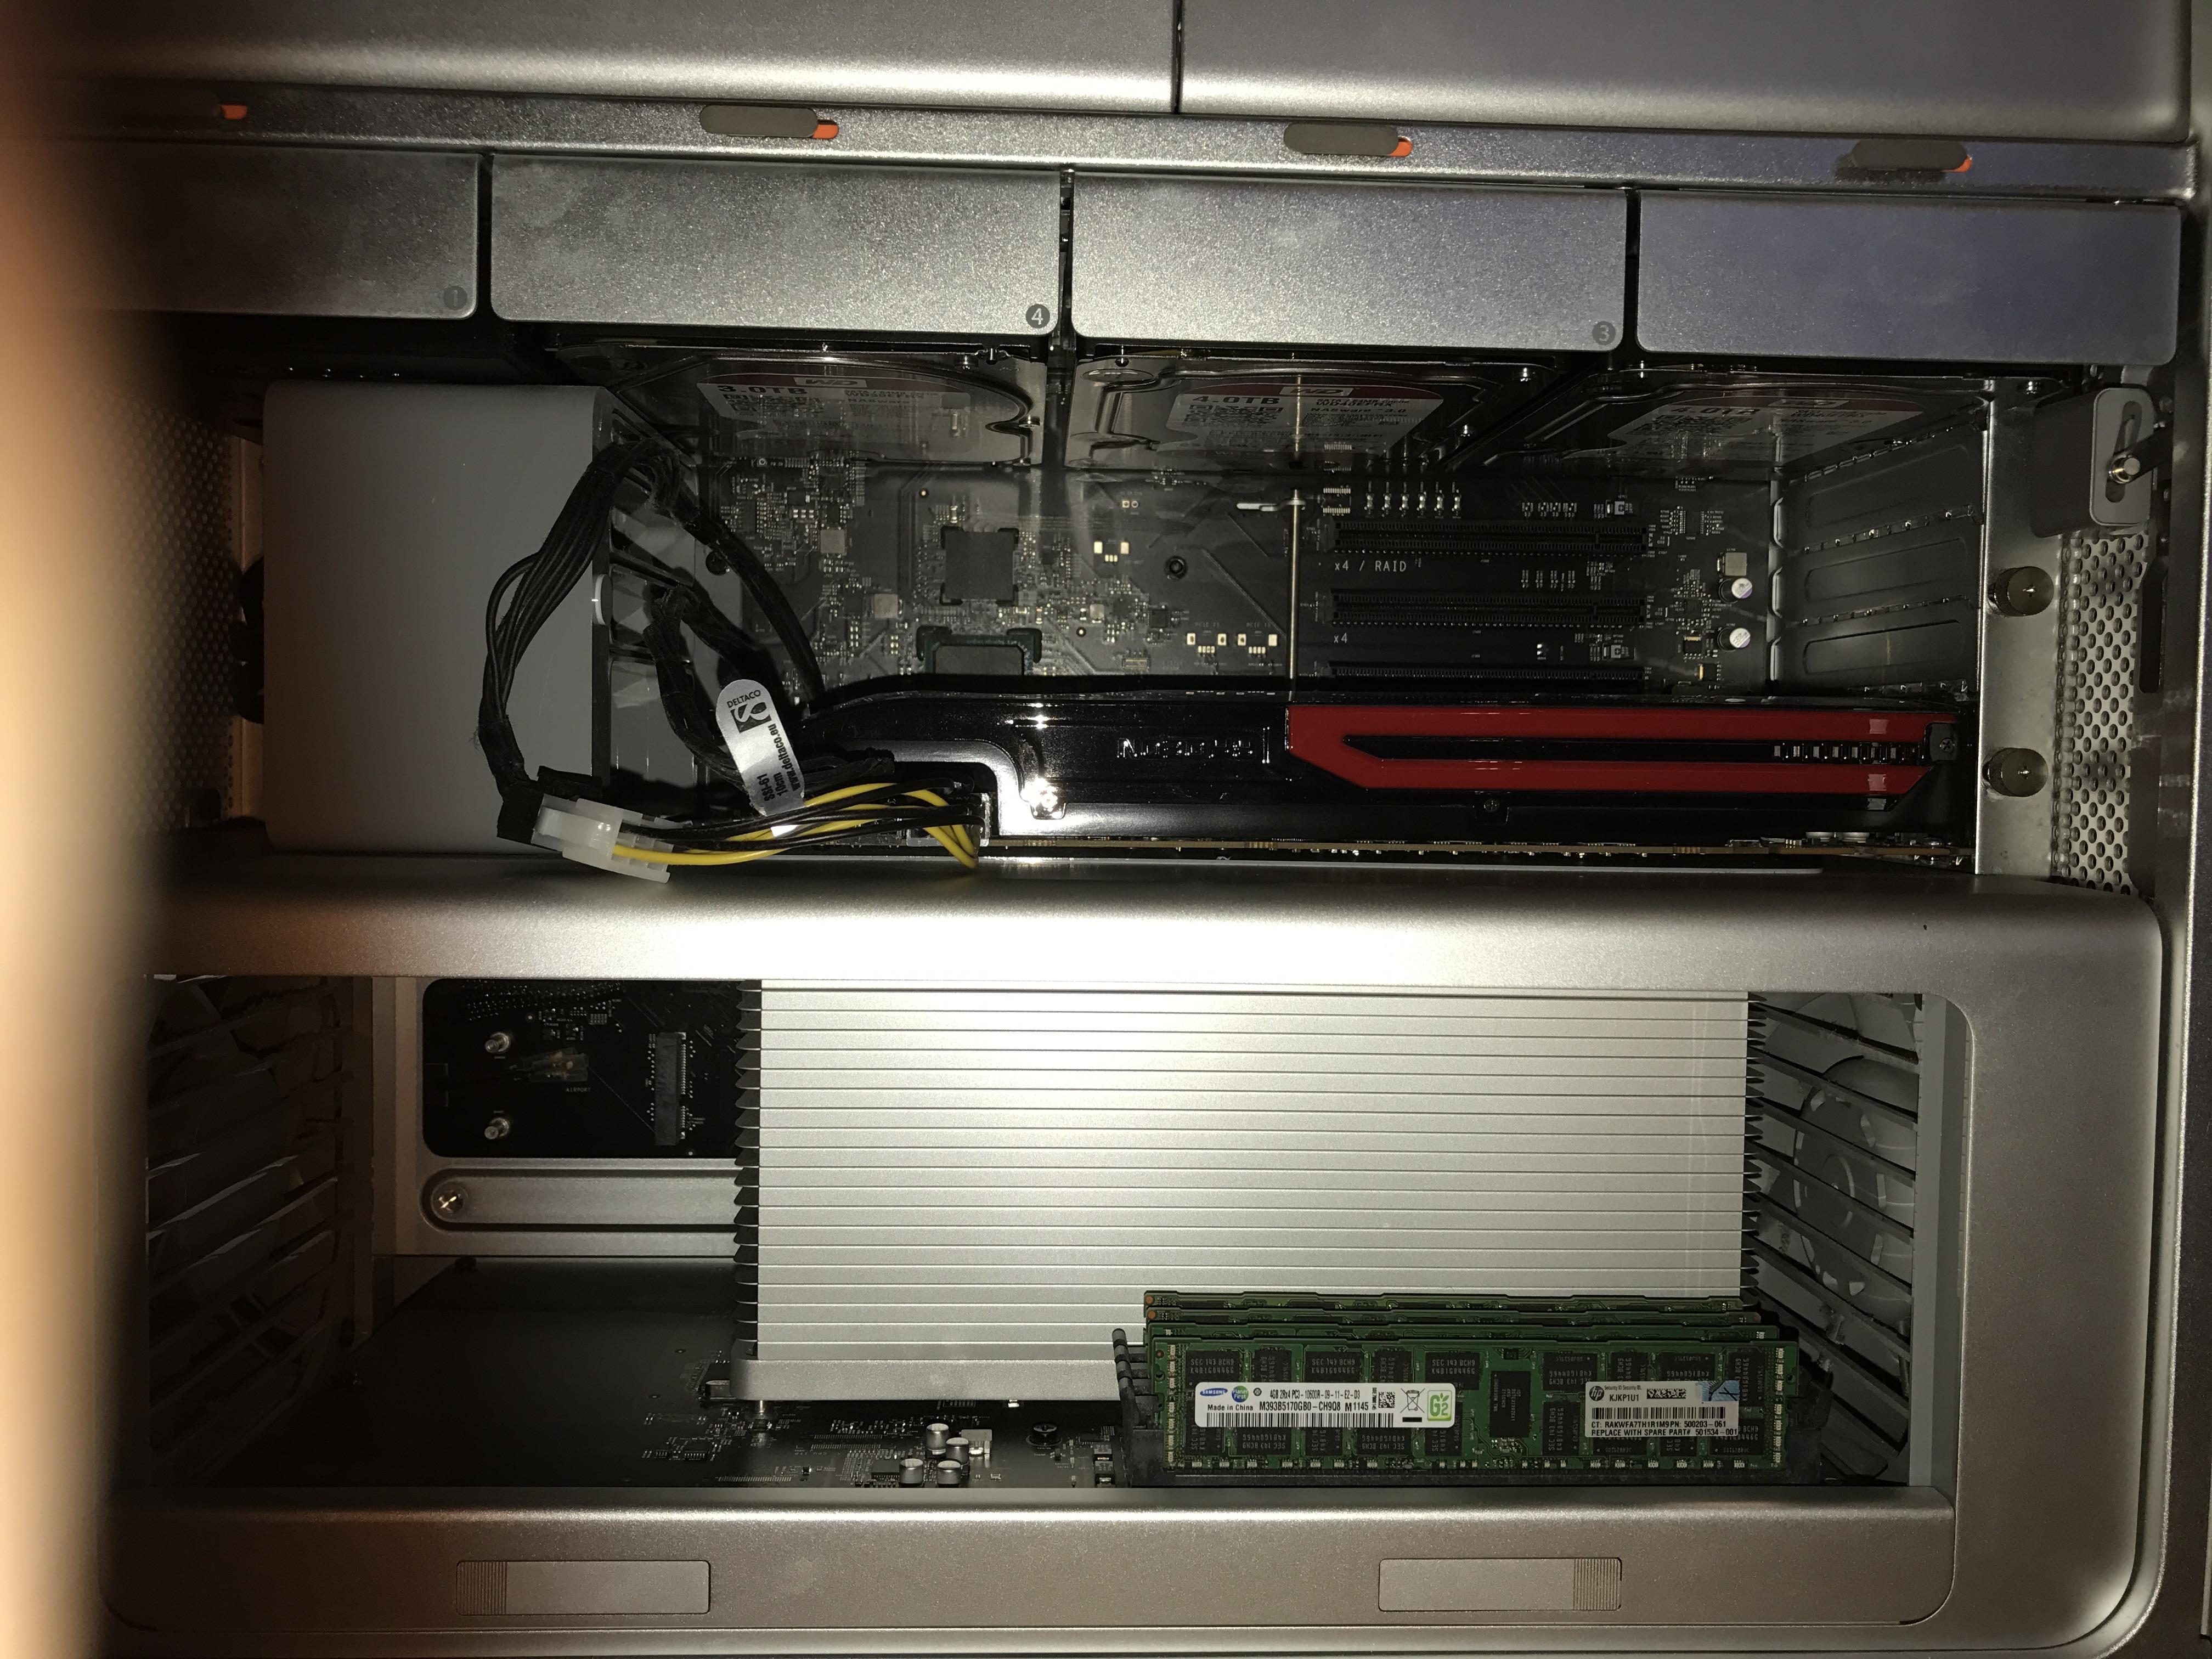 Nvidia GeForce GTX 980 on 5 1 | MacRumors Forums